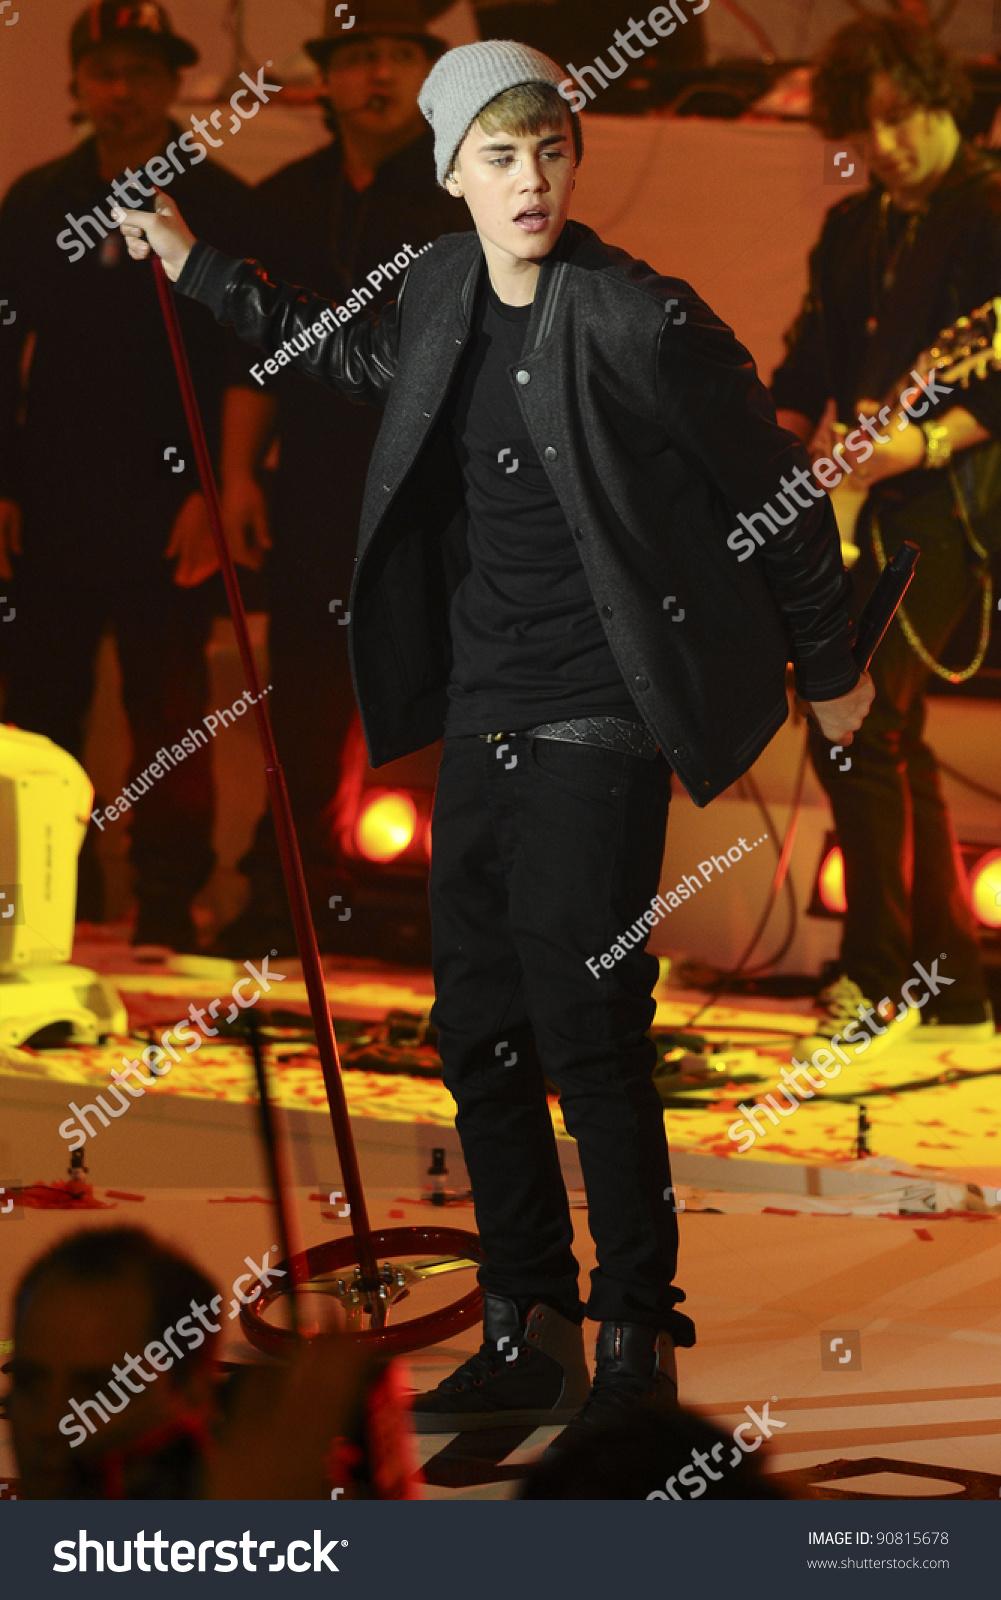 Justin Bieber Turns On Christmas Lights Stock Photo (Edit Now ...